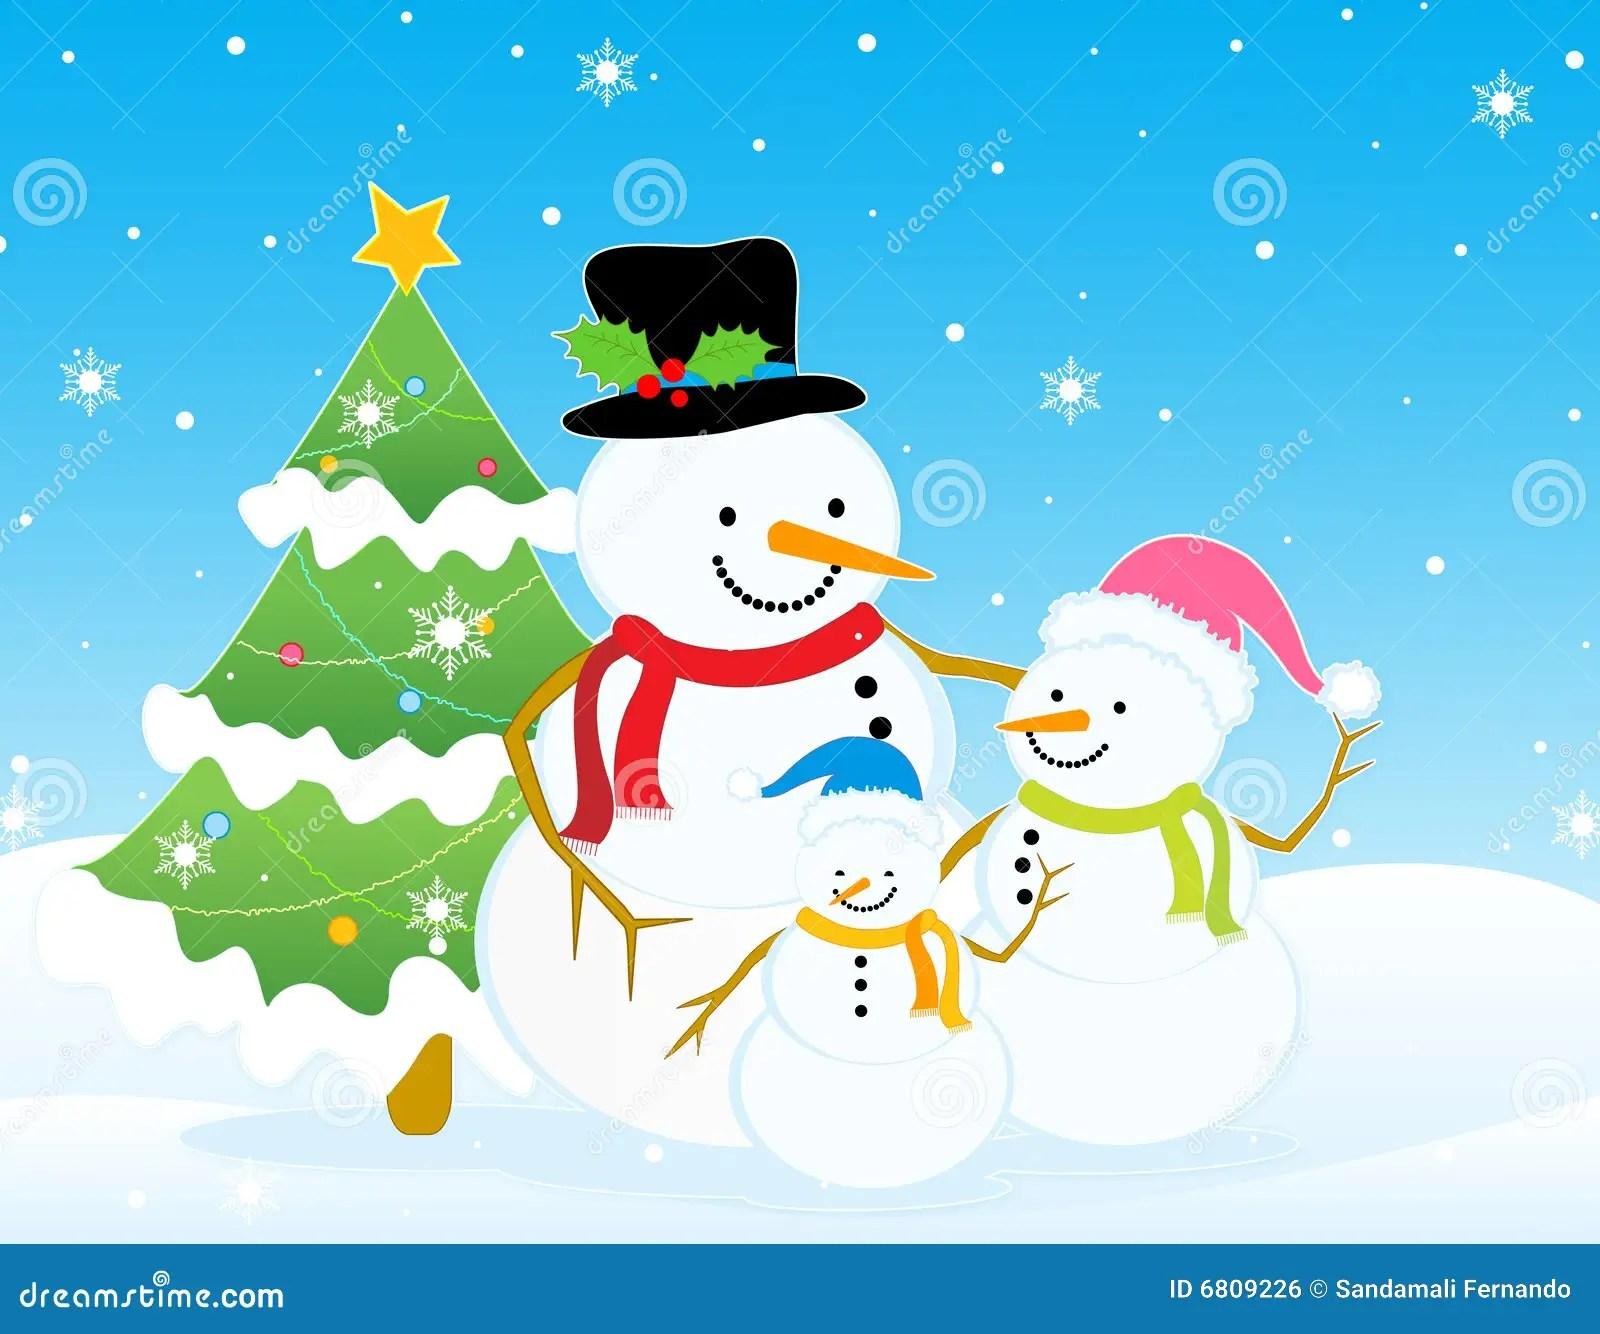 Turkey Wallpaper Cute Snowman Christmas Winter Background Royalty Free Stock